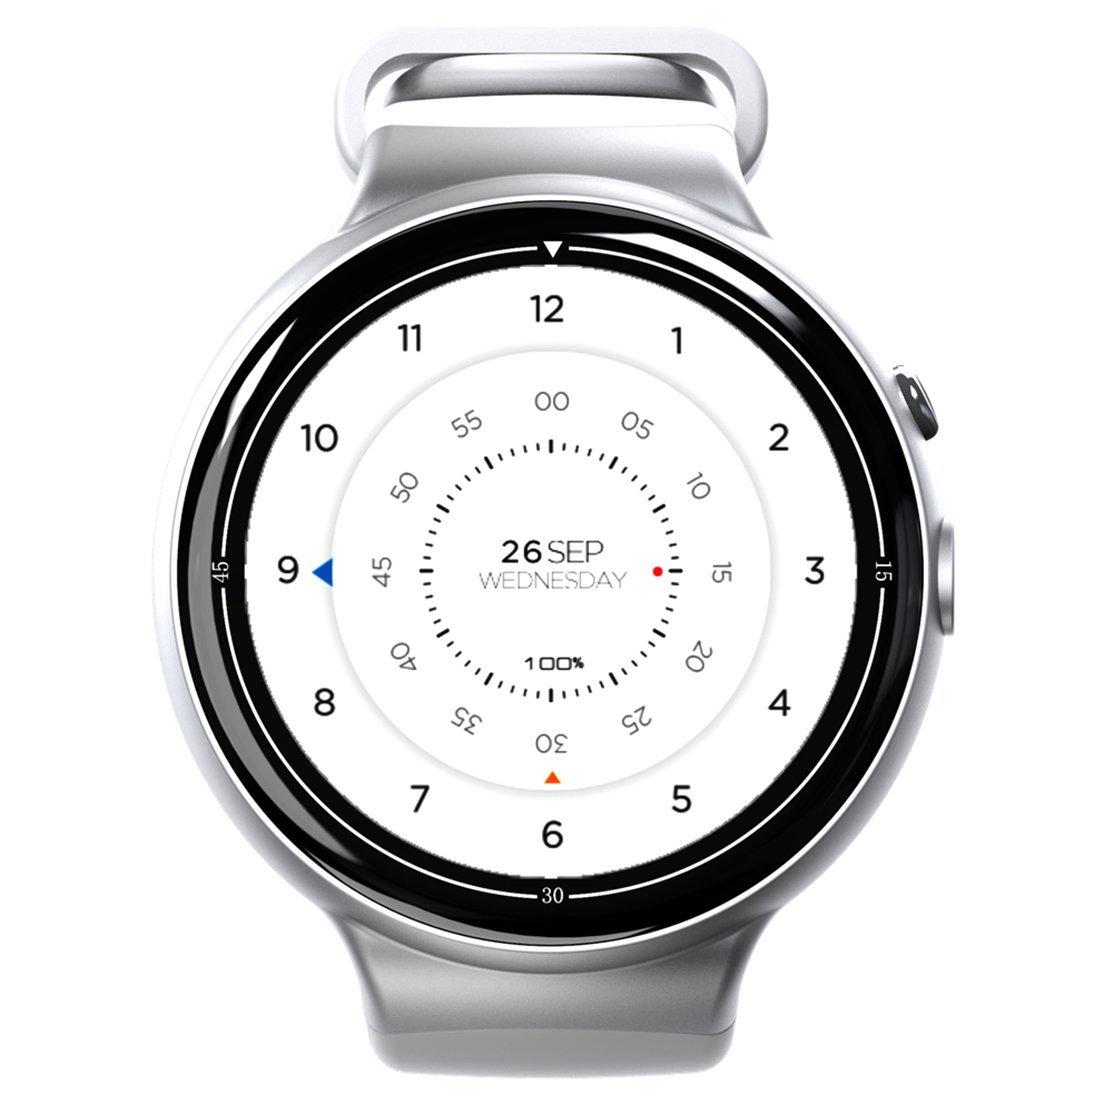 Bluetooth reloj inteligente, i4air 3 G inteligente reloj teléfono ...